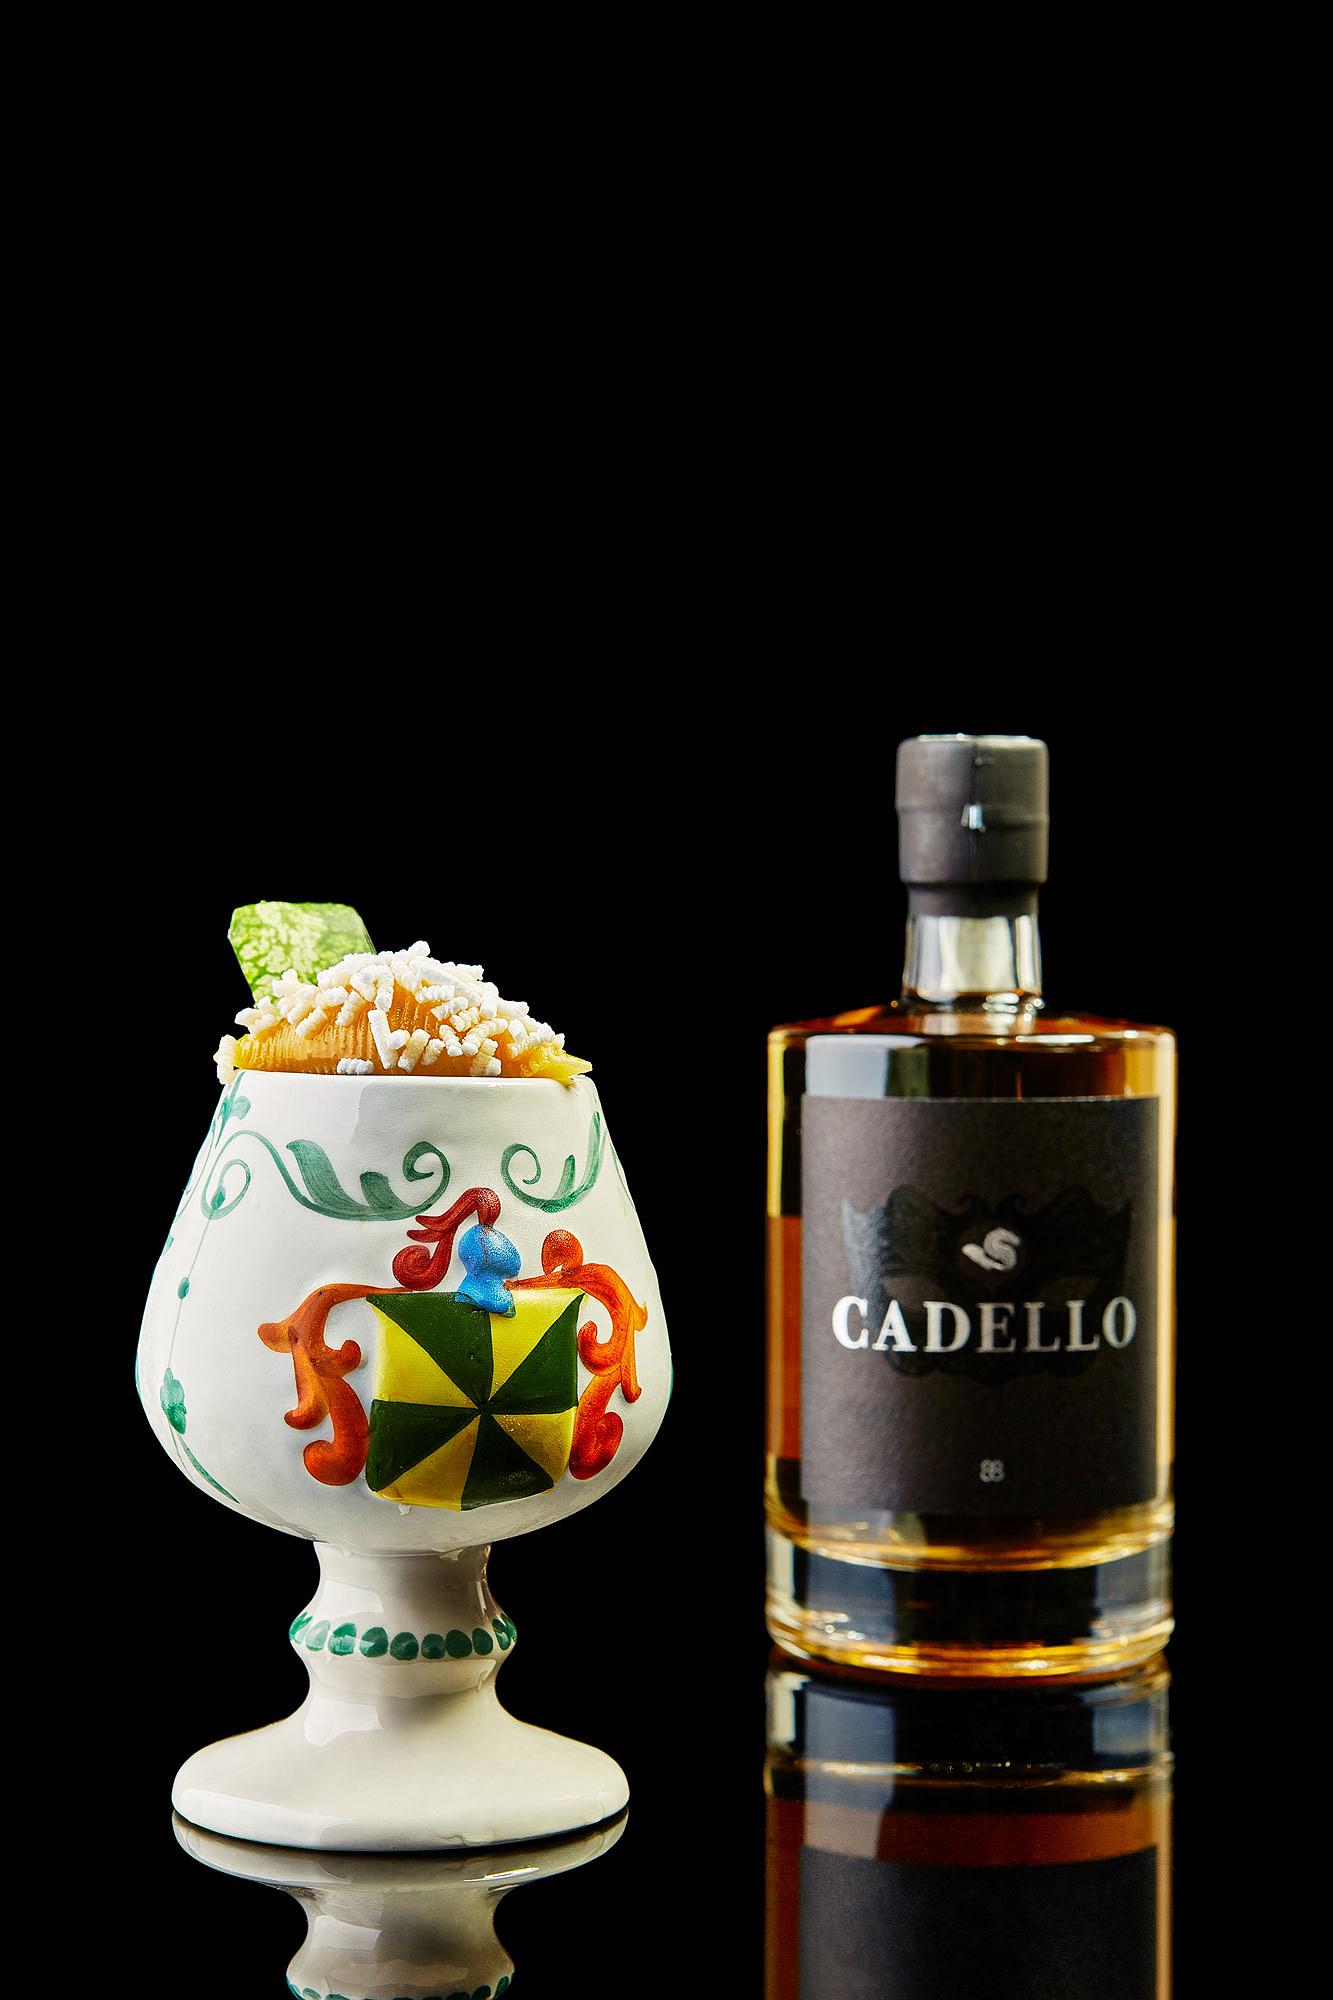 Barababao_Cadello_Cocktail_fabio_camboni Bartender